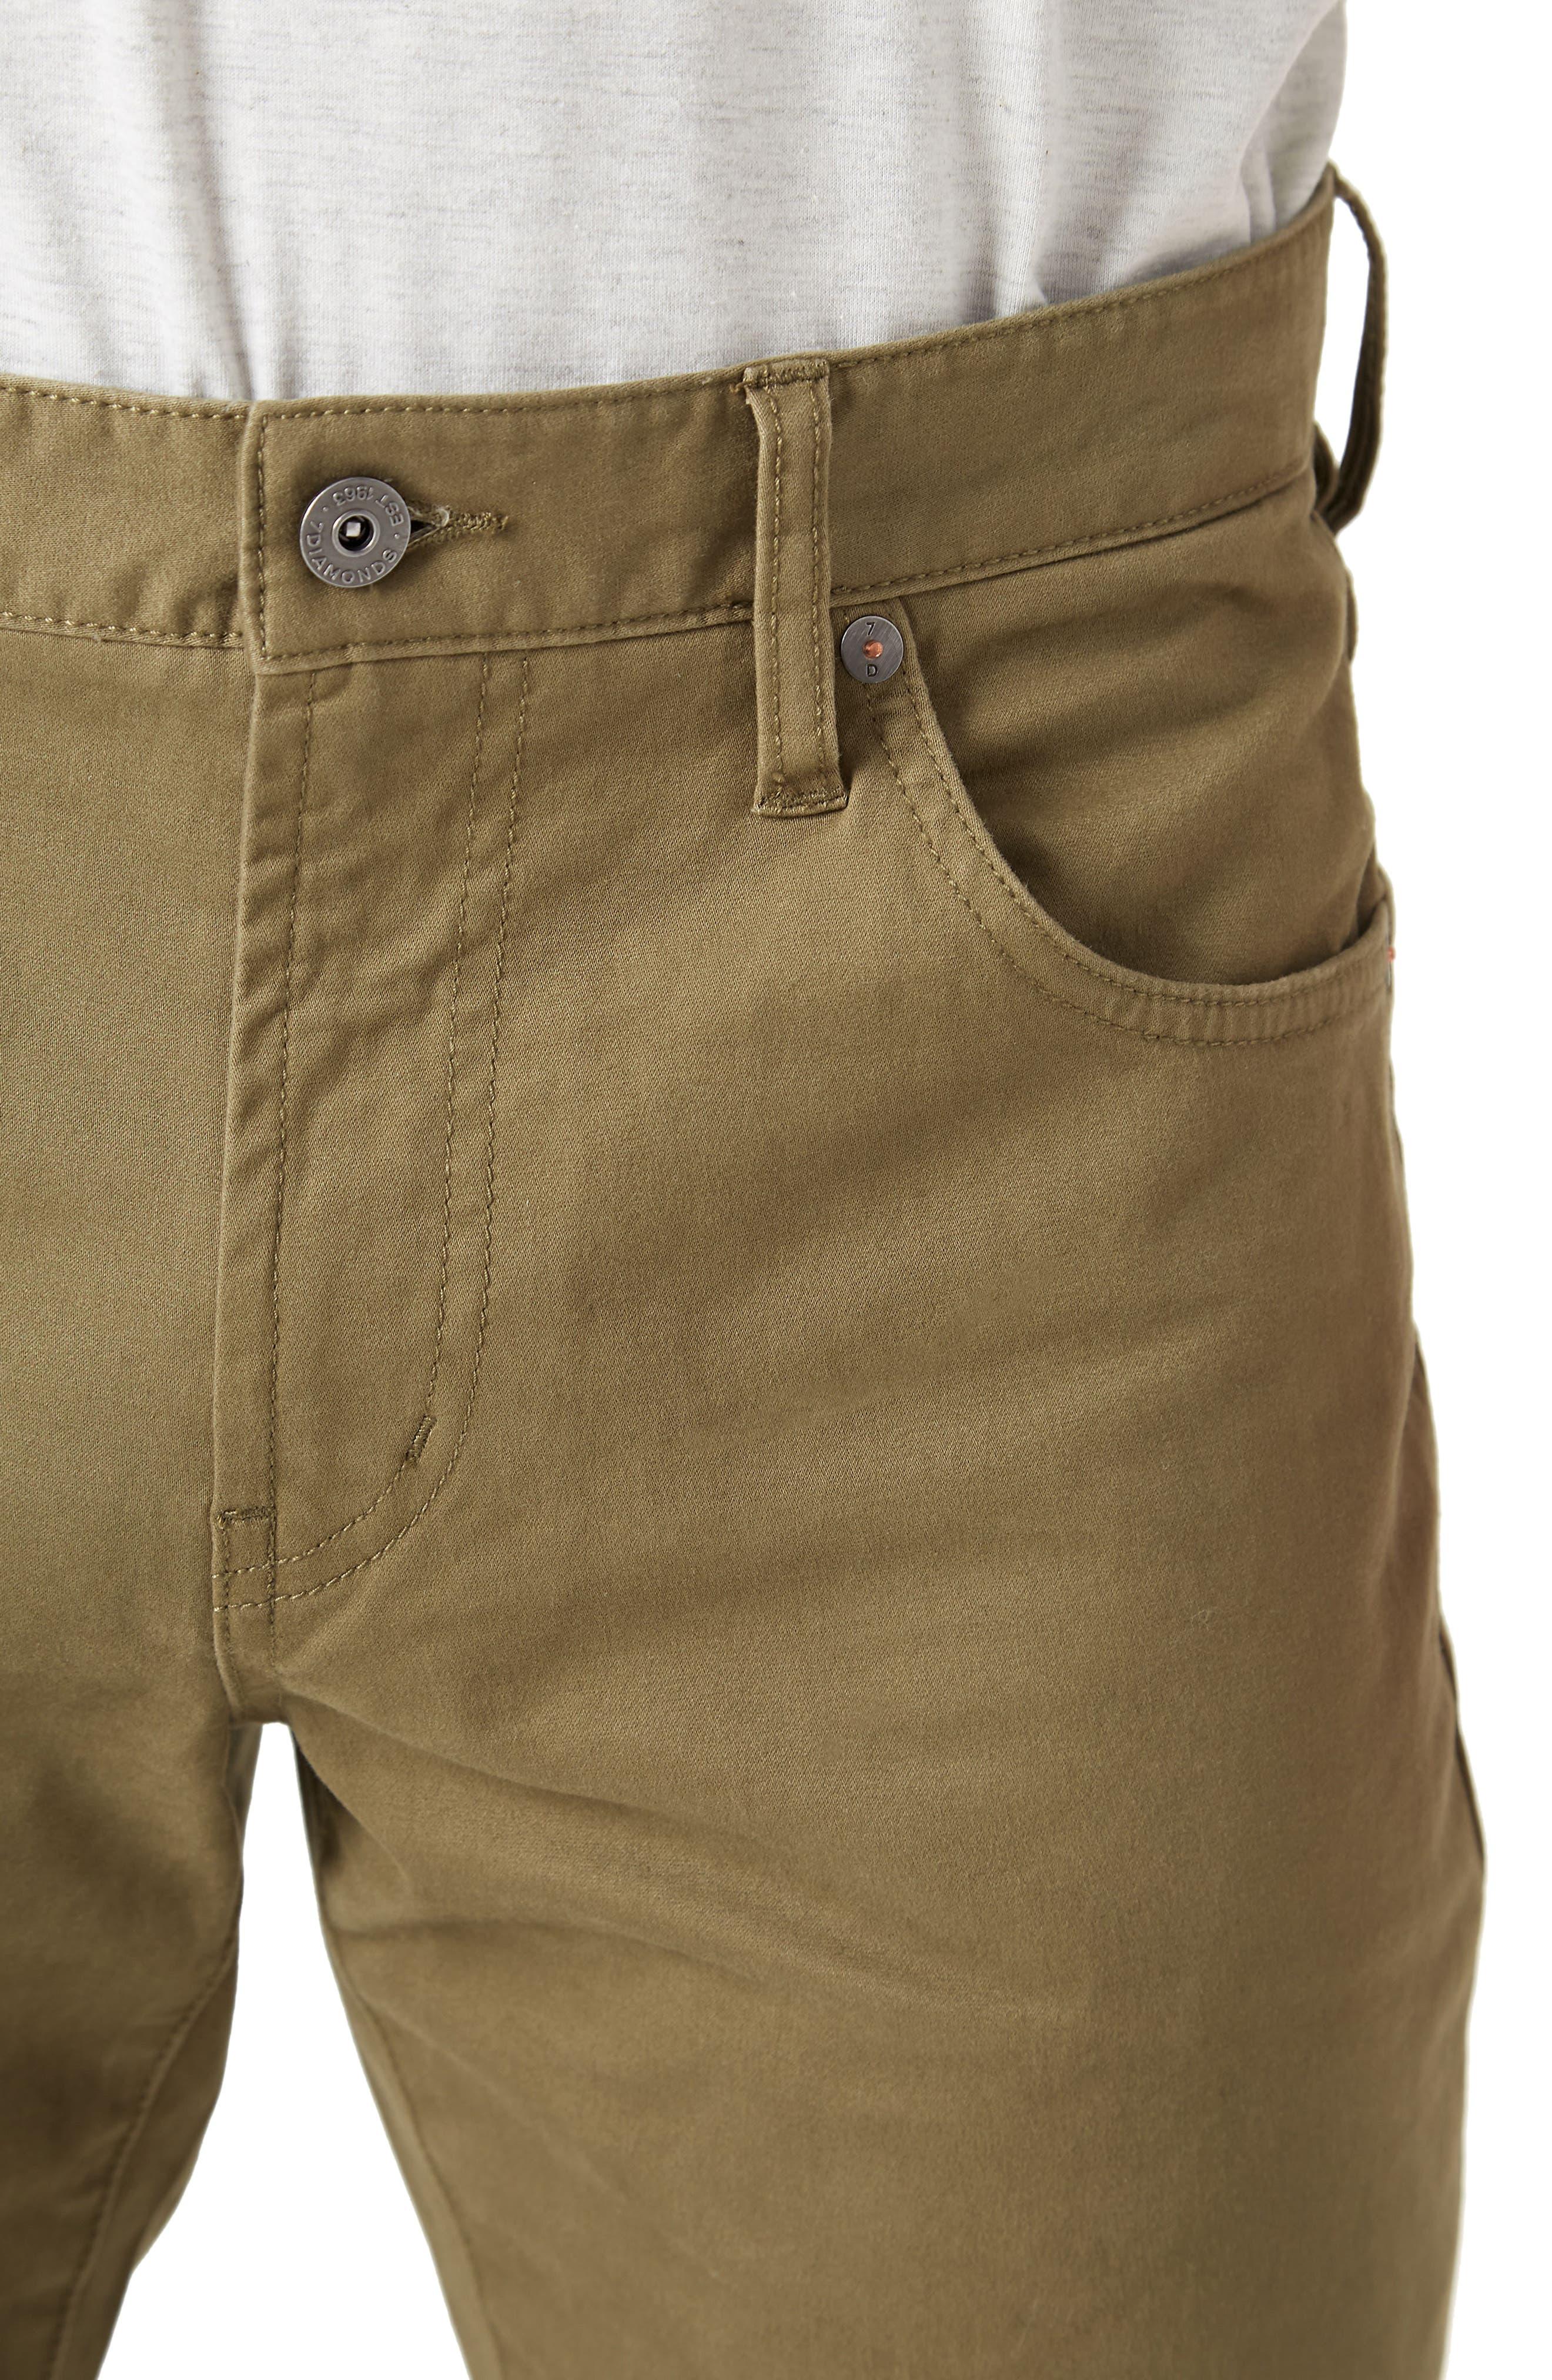 Brushed Twill Five-Pocket Pants,                             Alternate thumbnail 4, color,                             CHIP